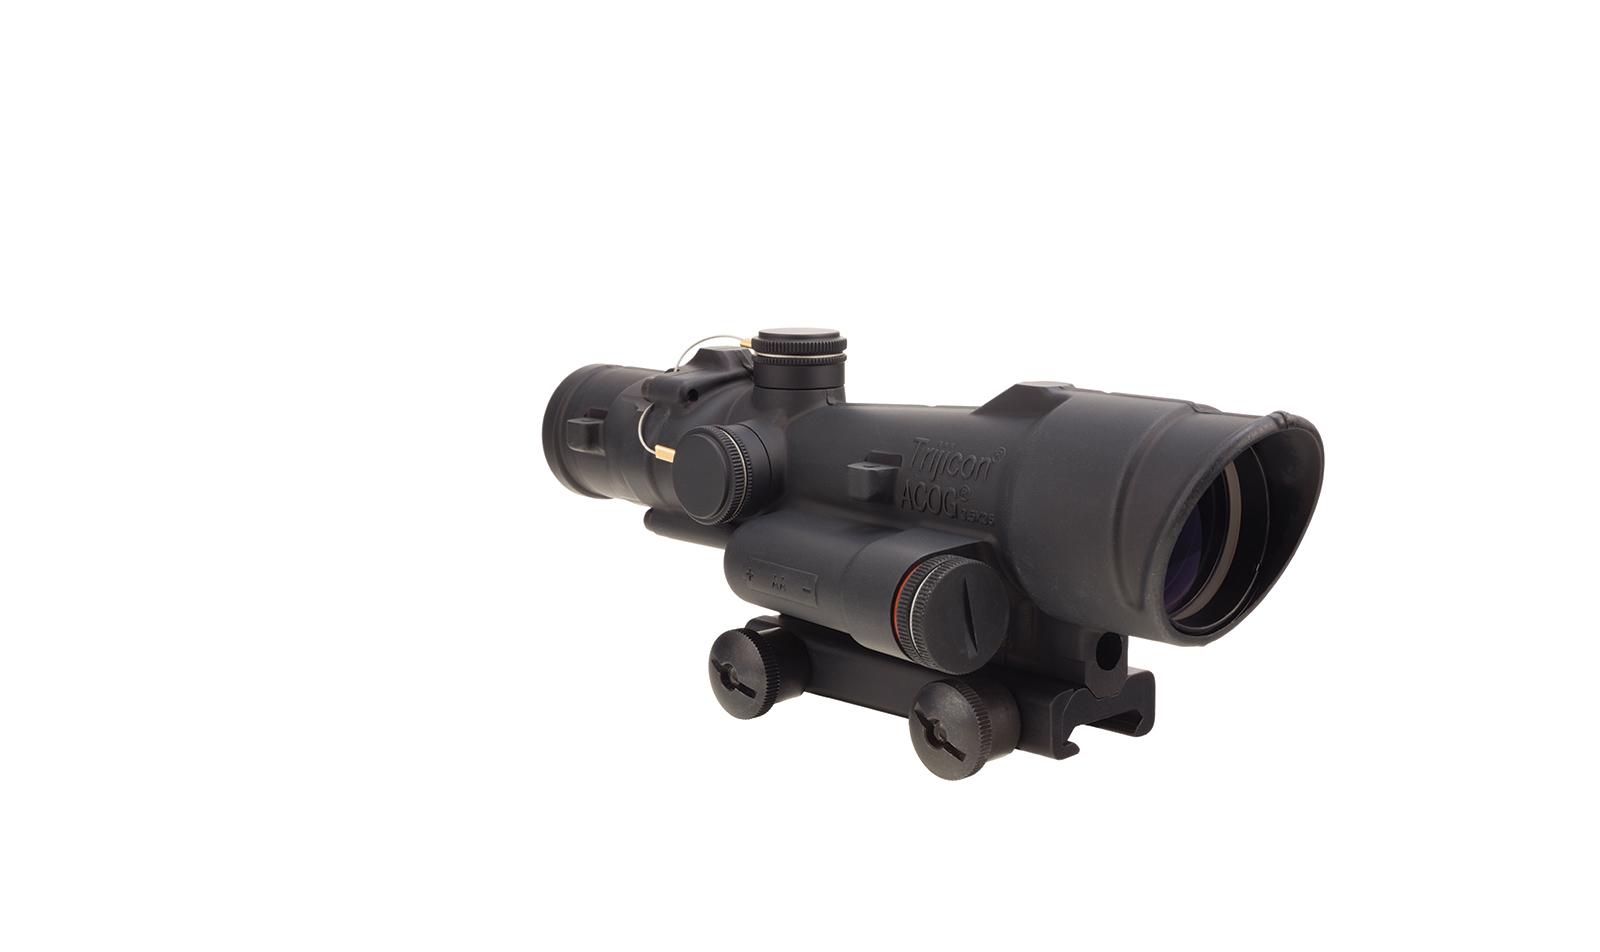 TA110-D-100500 angle 7